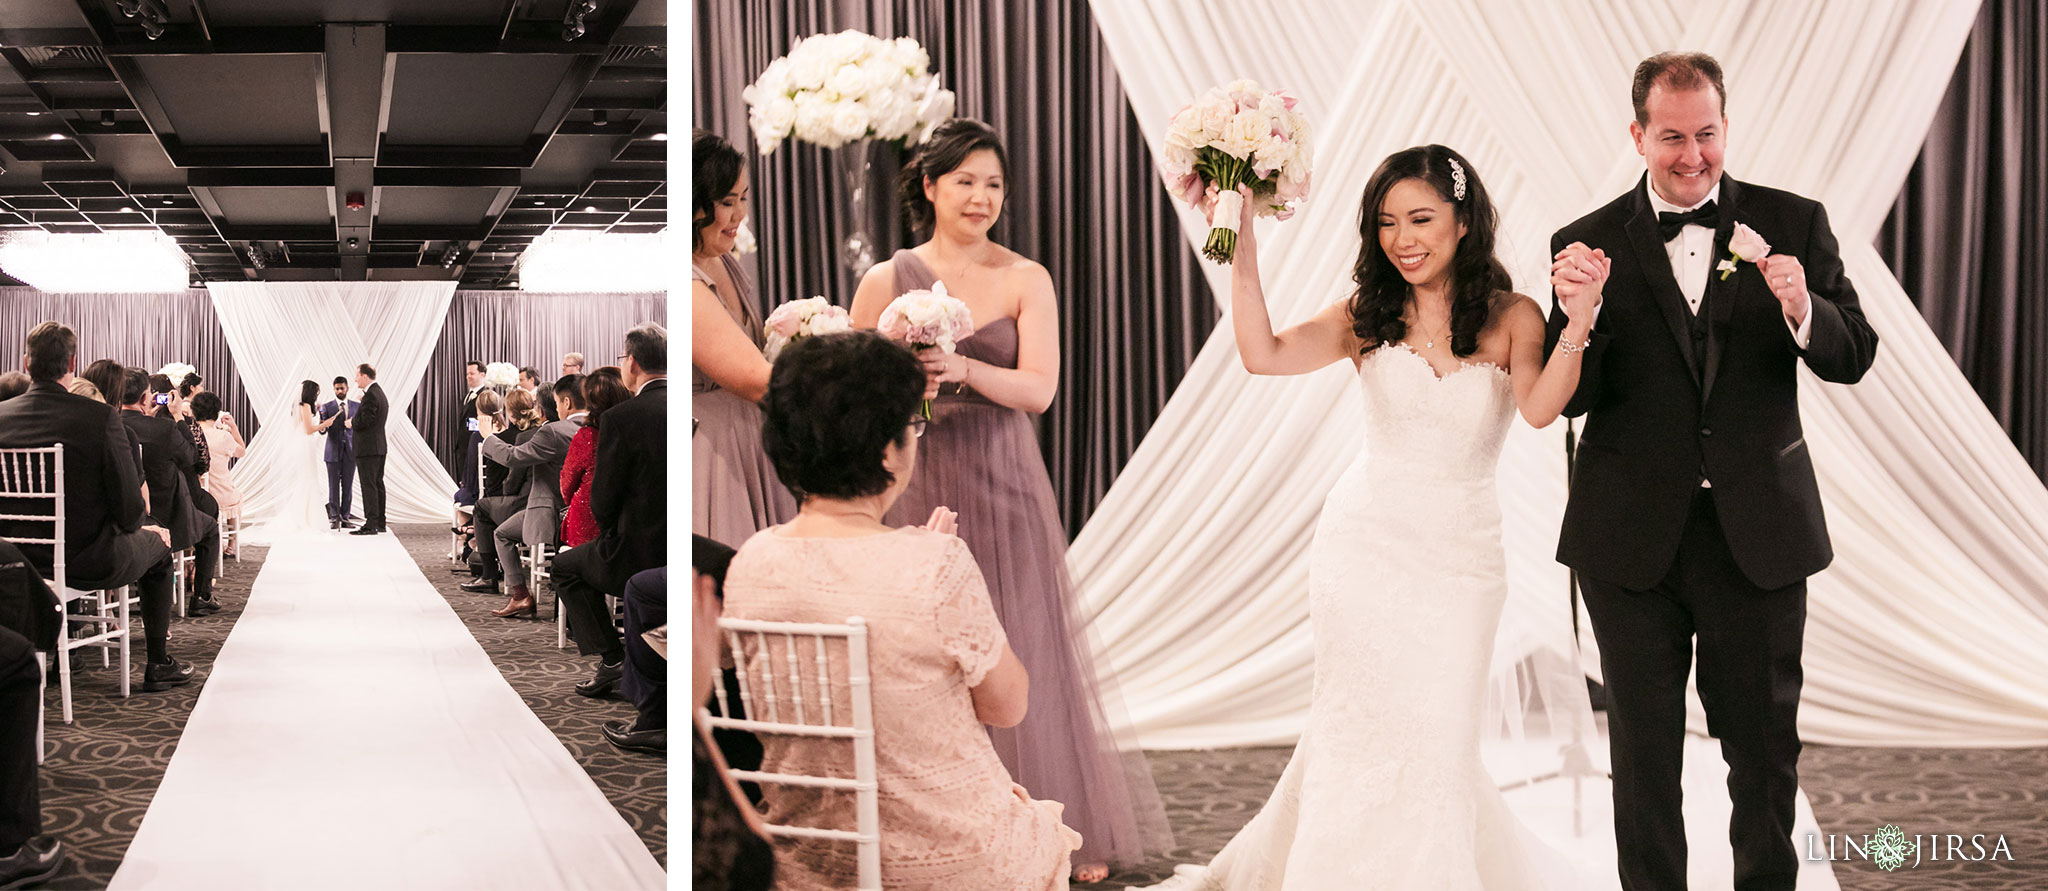 25 vertigo banquet hall glendale wedding photography